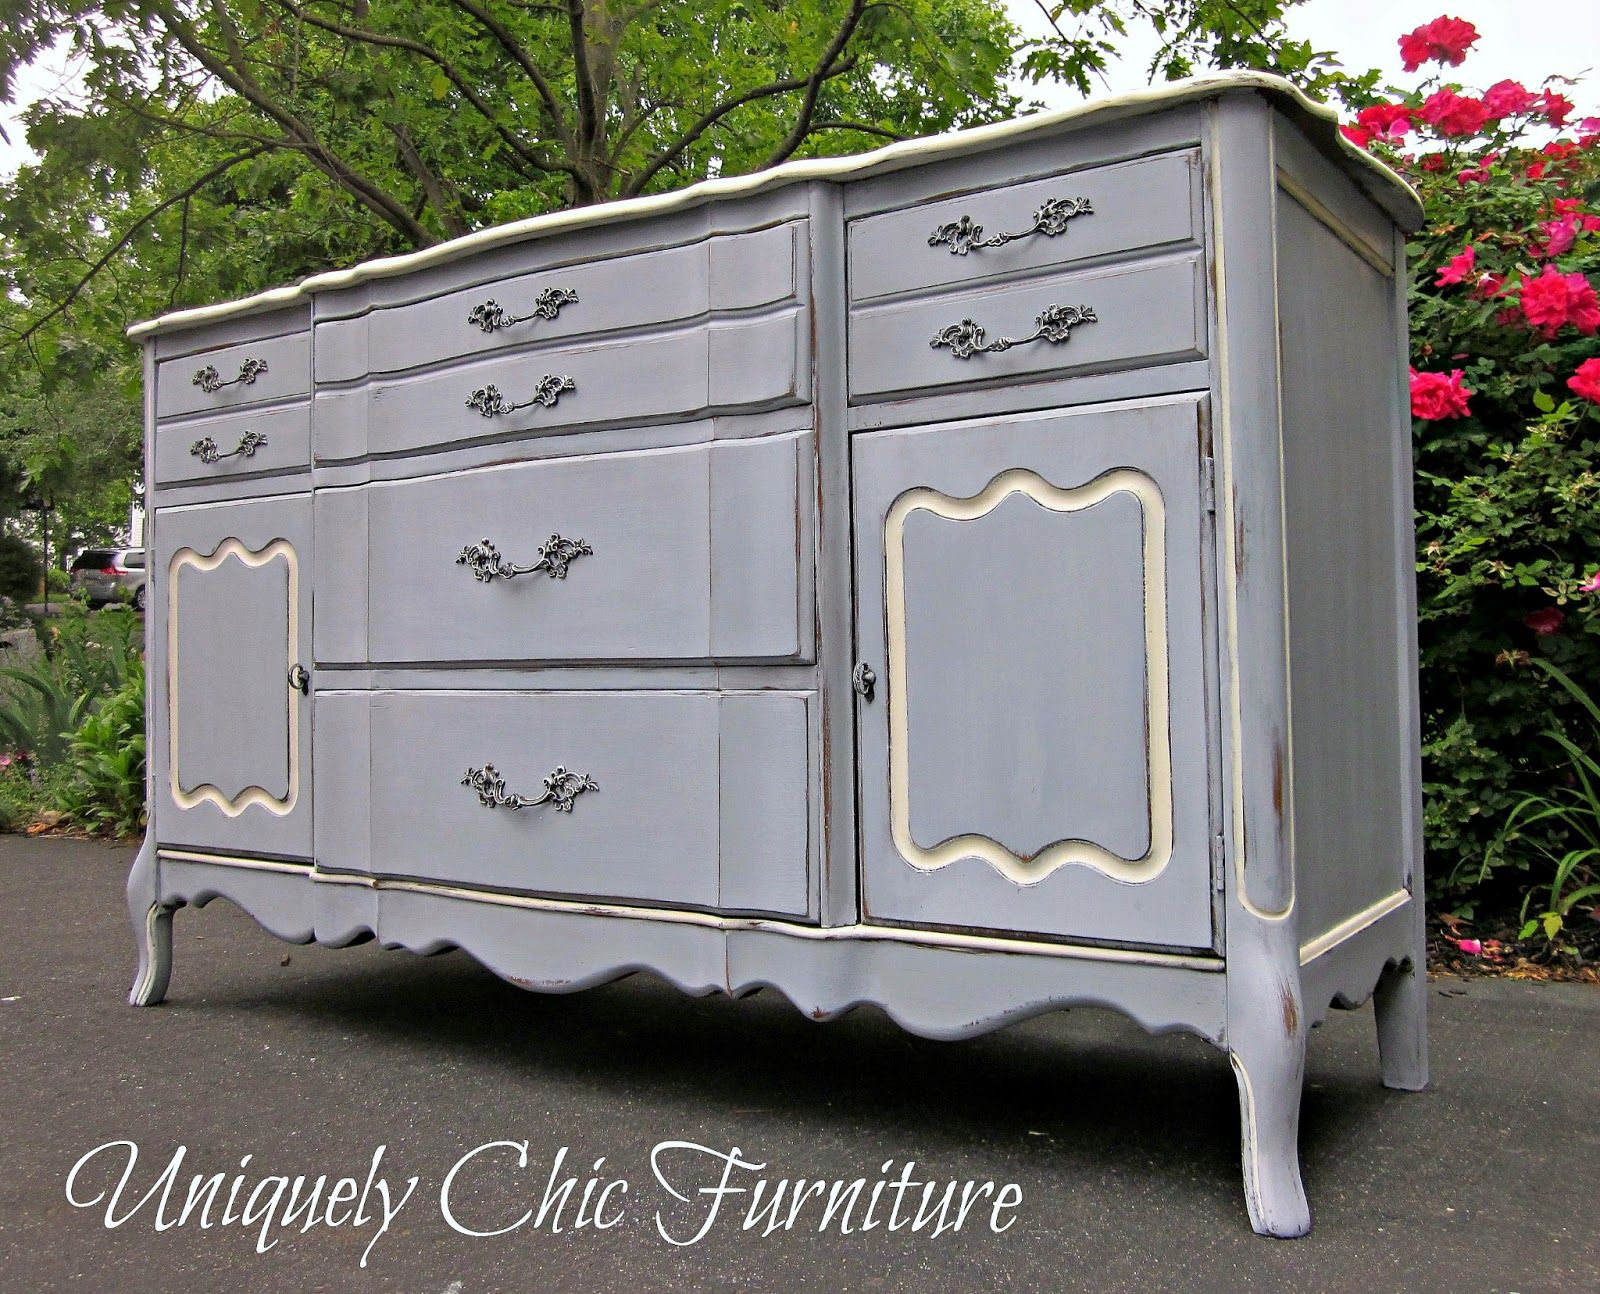 Uniquely Chic Furniture: Show Me The Money